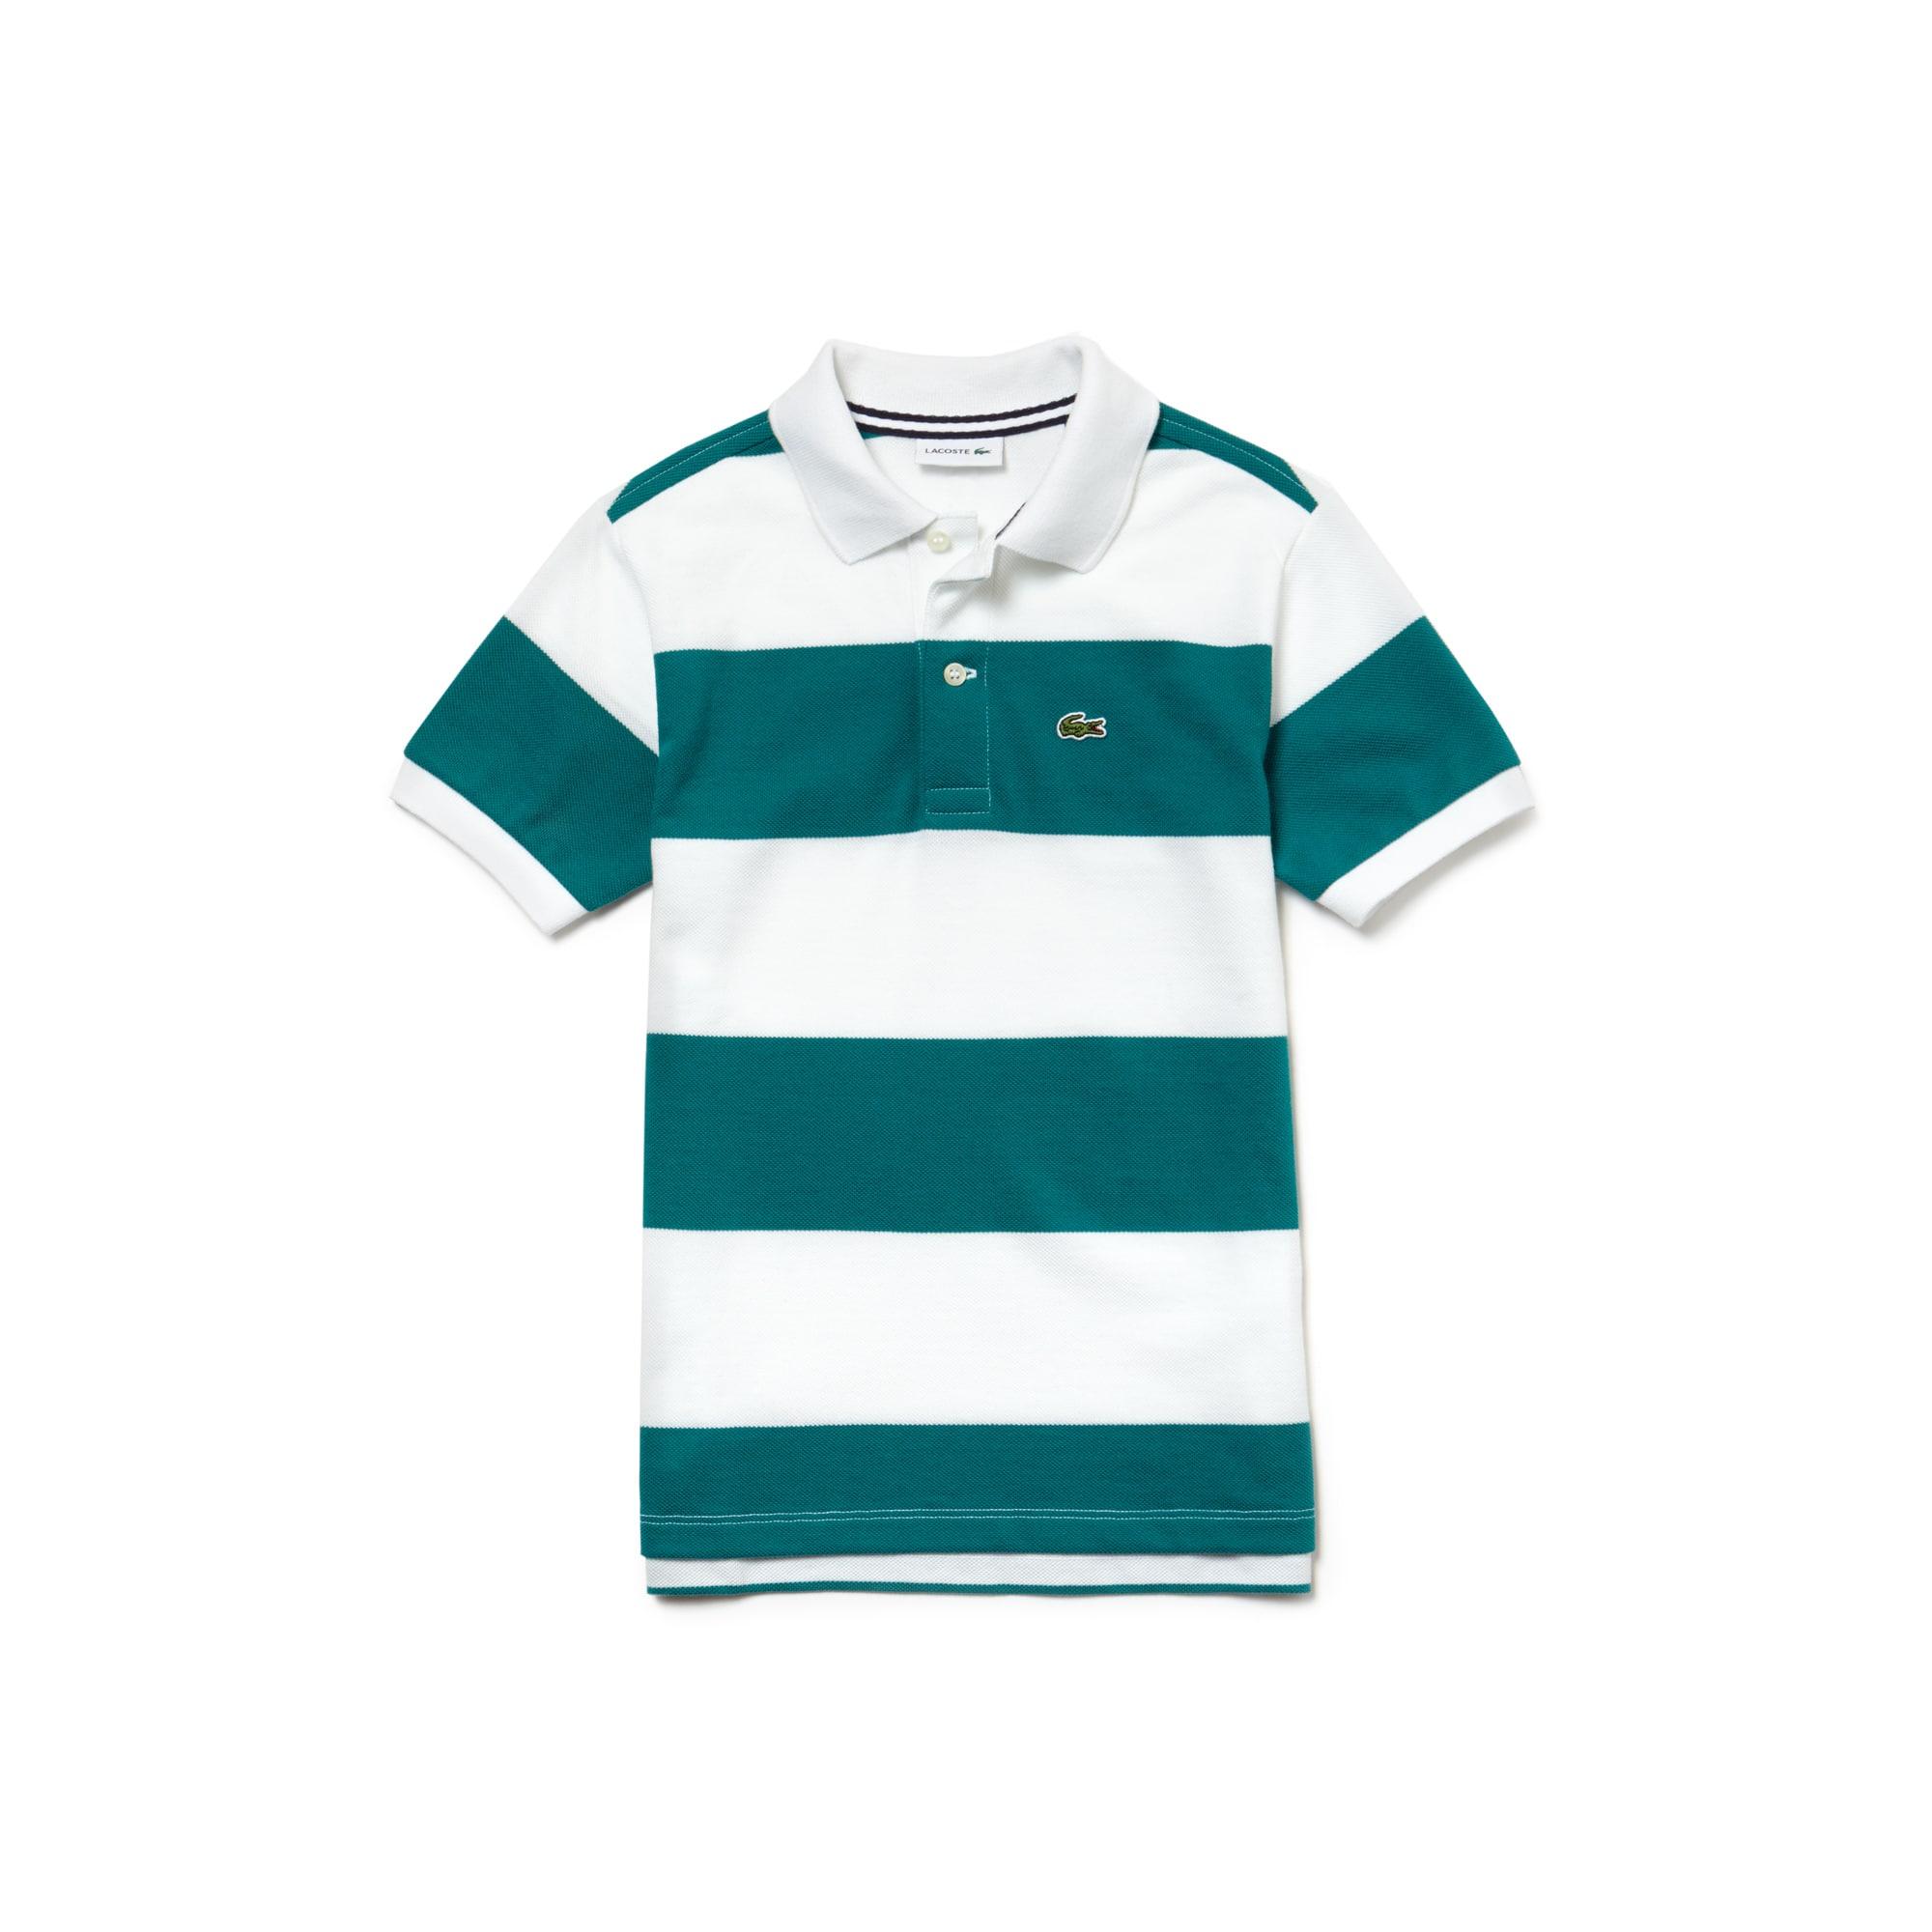 Boys' Lacoste Striped Cotton Petit Piqué Polo Shirt